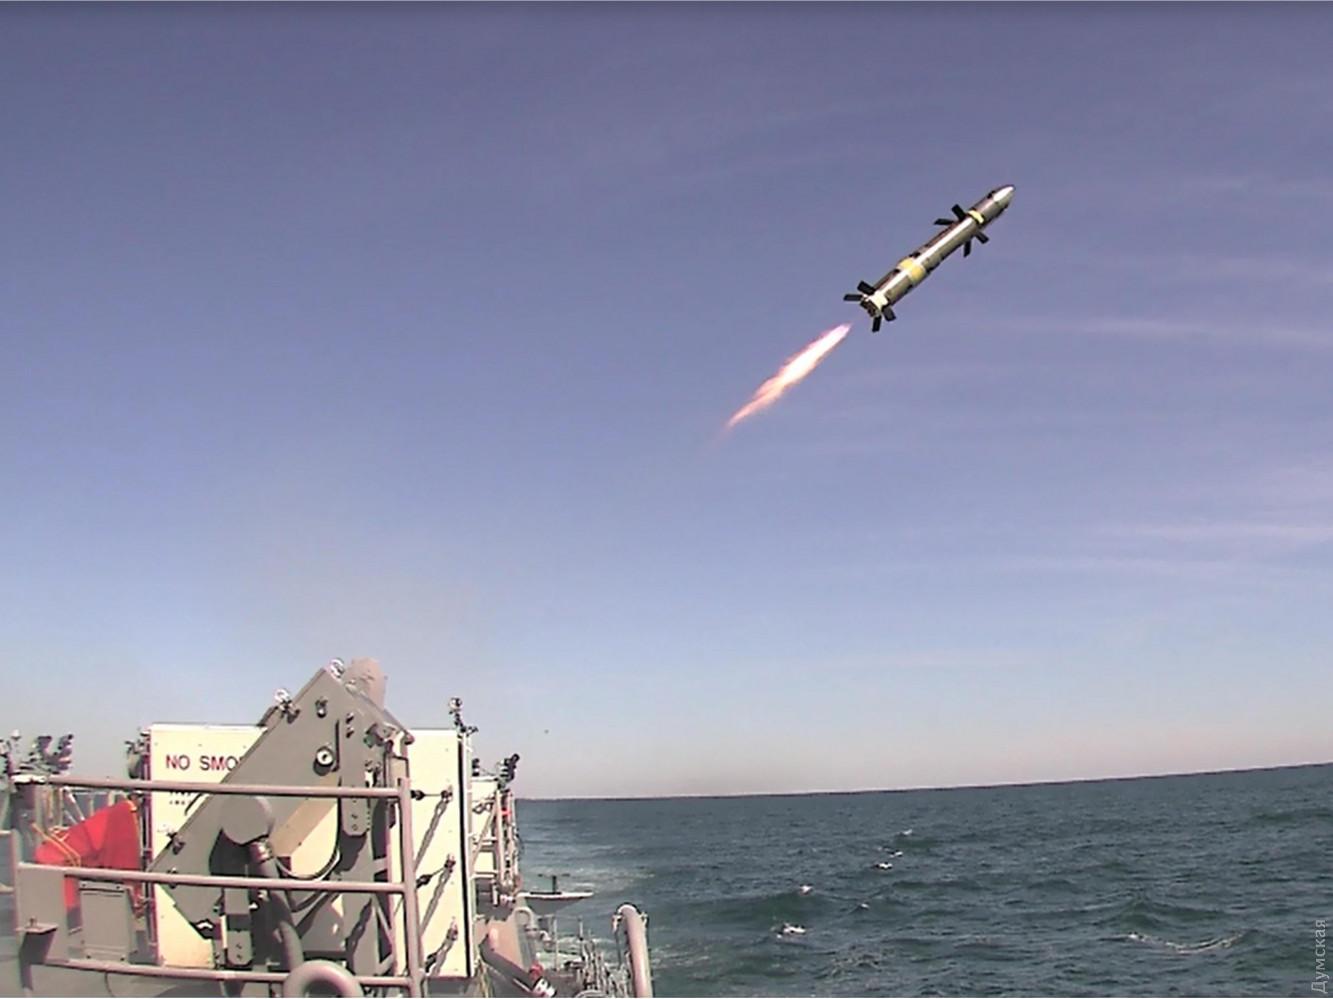 Запуск ракеты Raytheon ВGM-176B Block II со сторожевого катера ВМС США РС 5 Typhoon